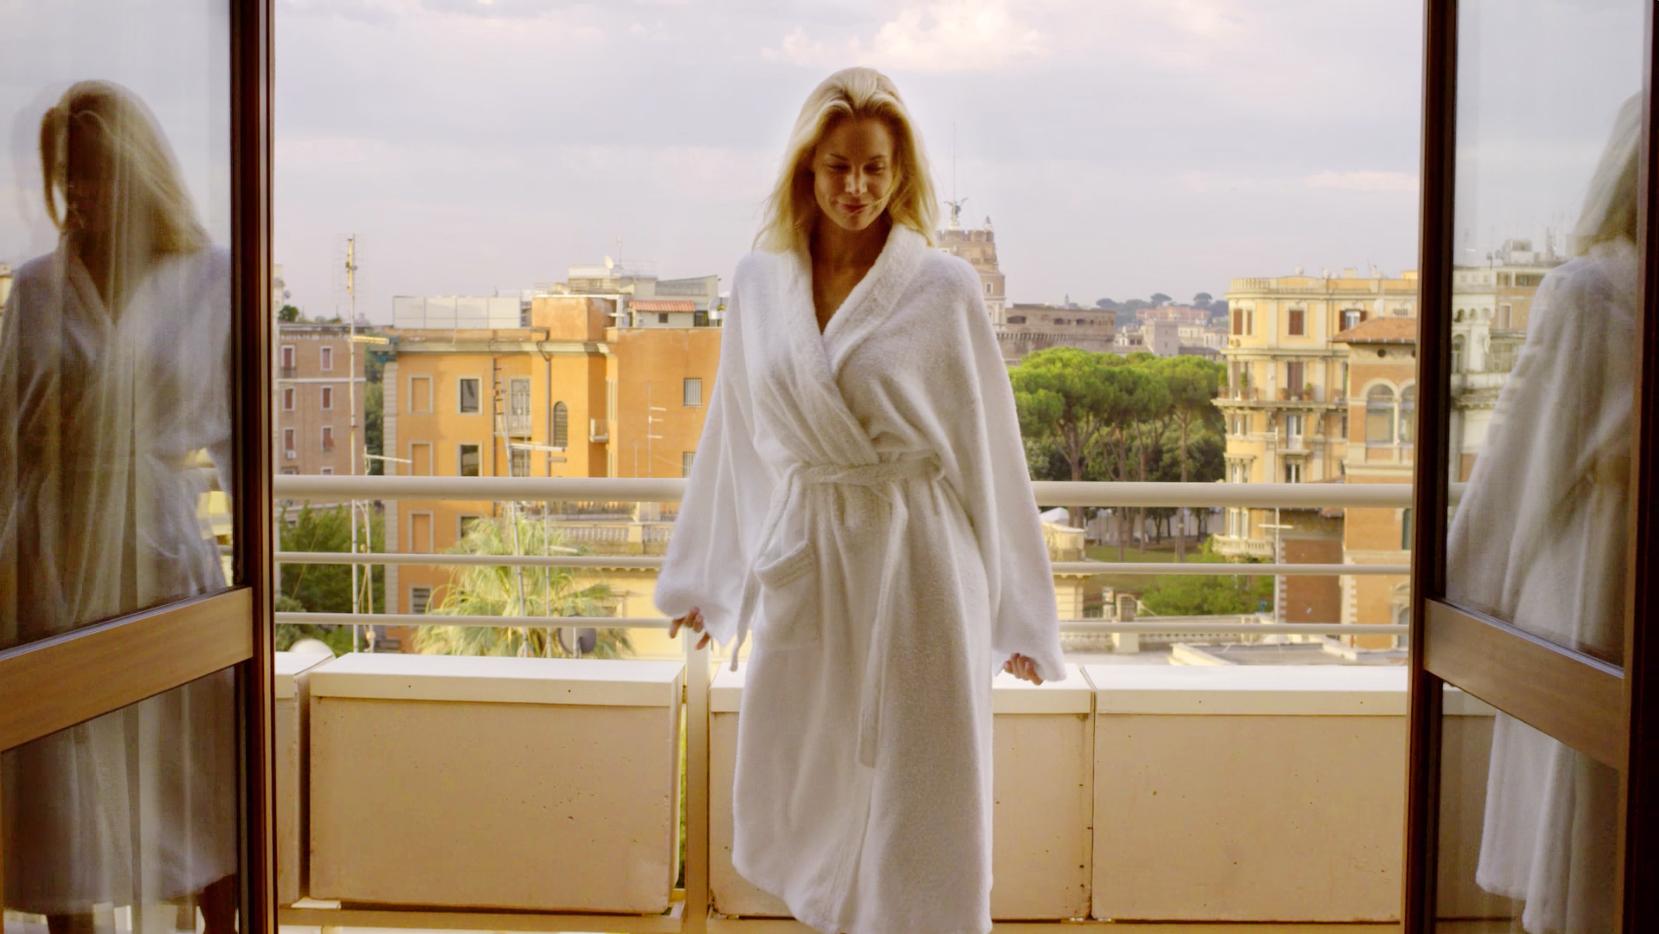 MO 2014 Video Screen Shot_Hotel Balcony2_CXjhm